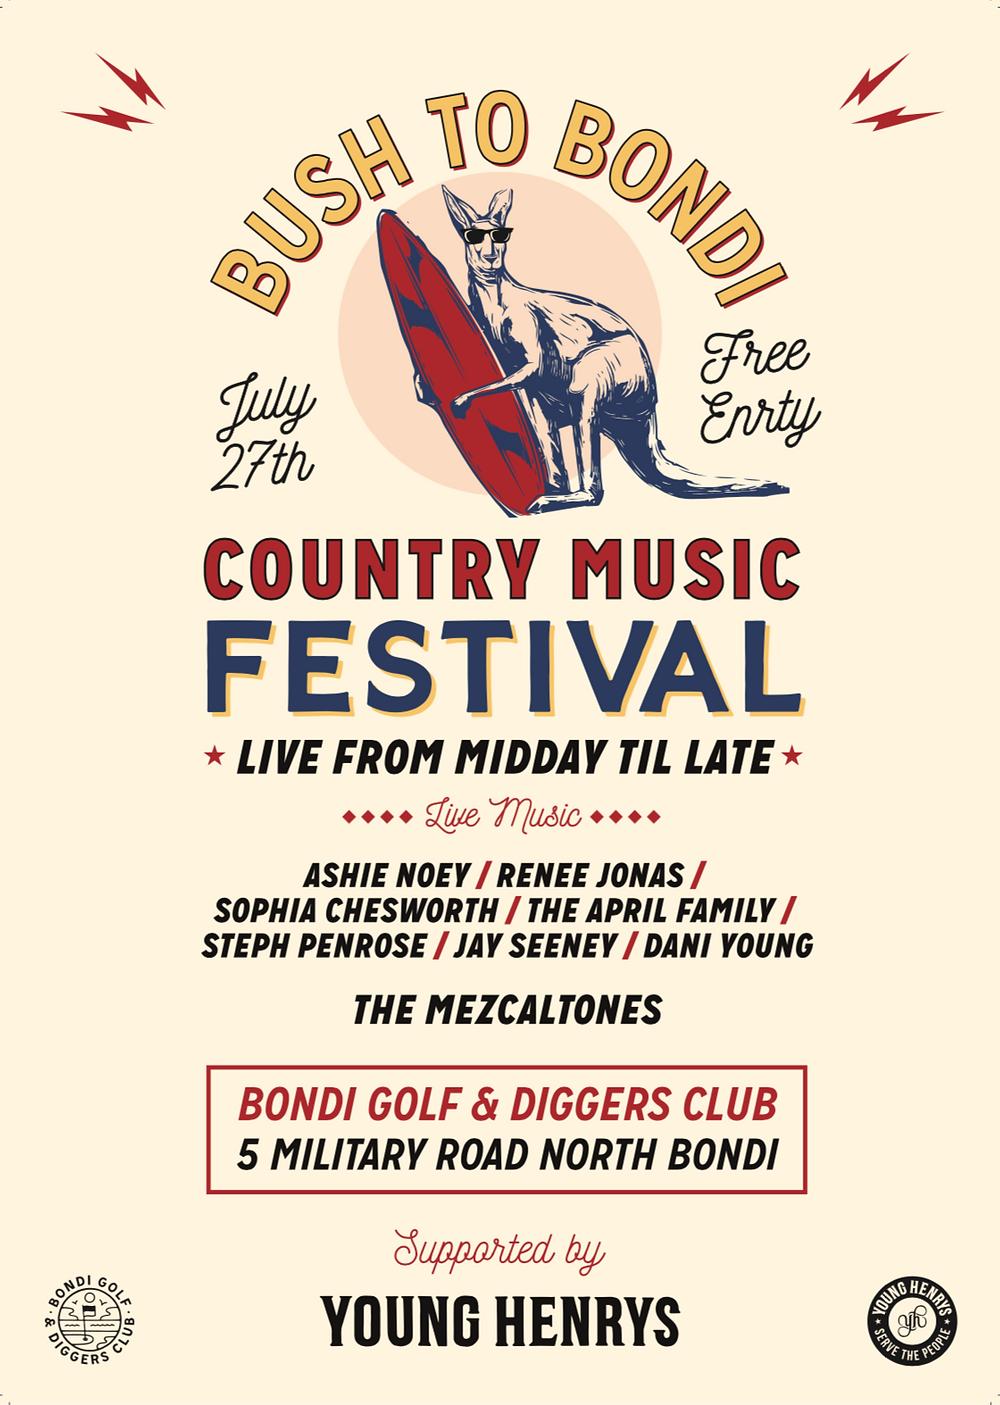 Bush to Bondi country music festival poster